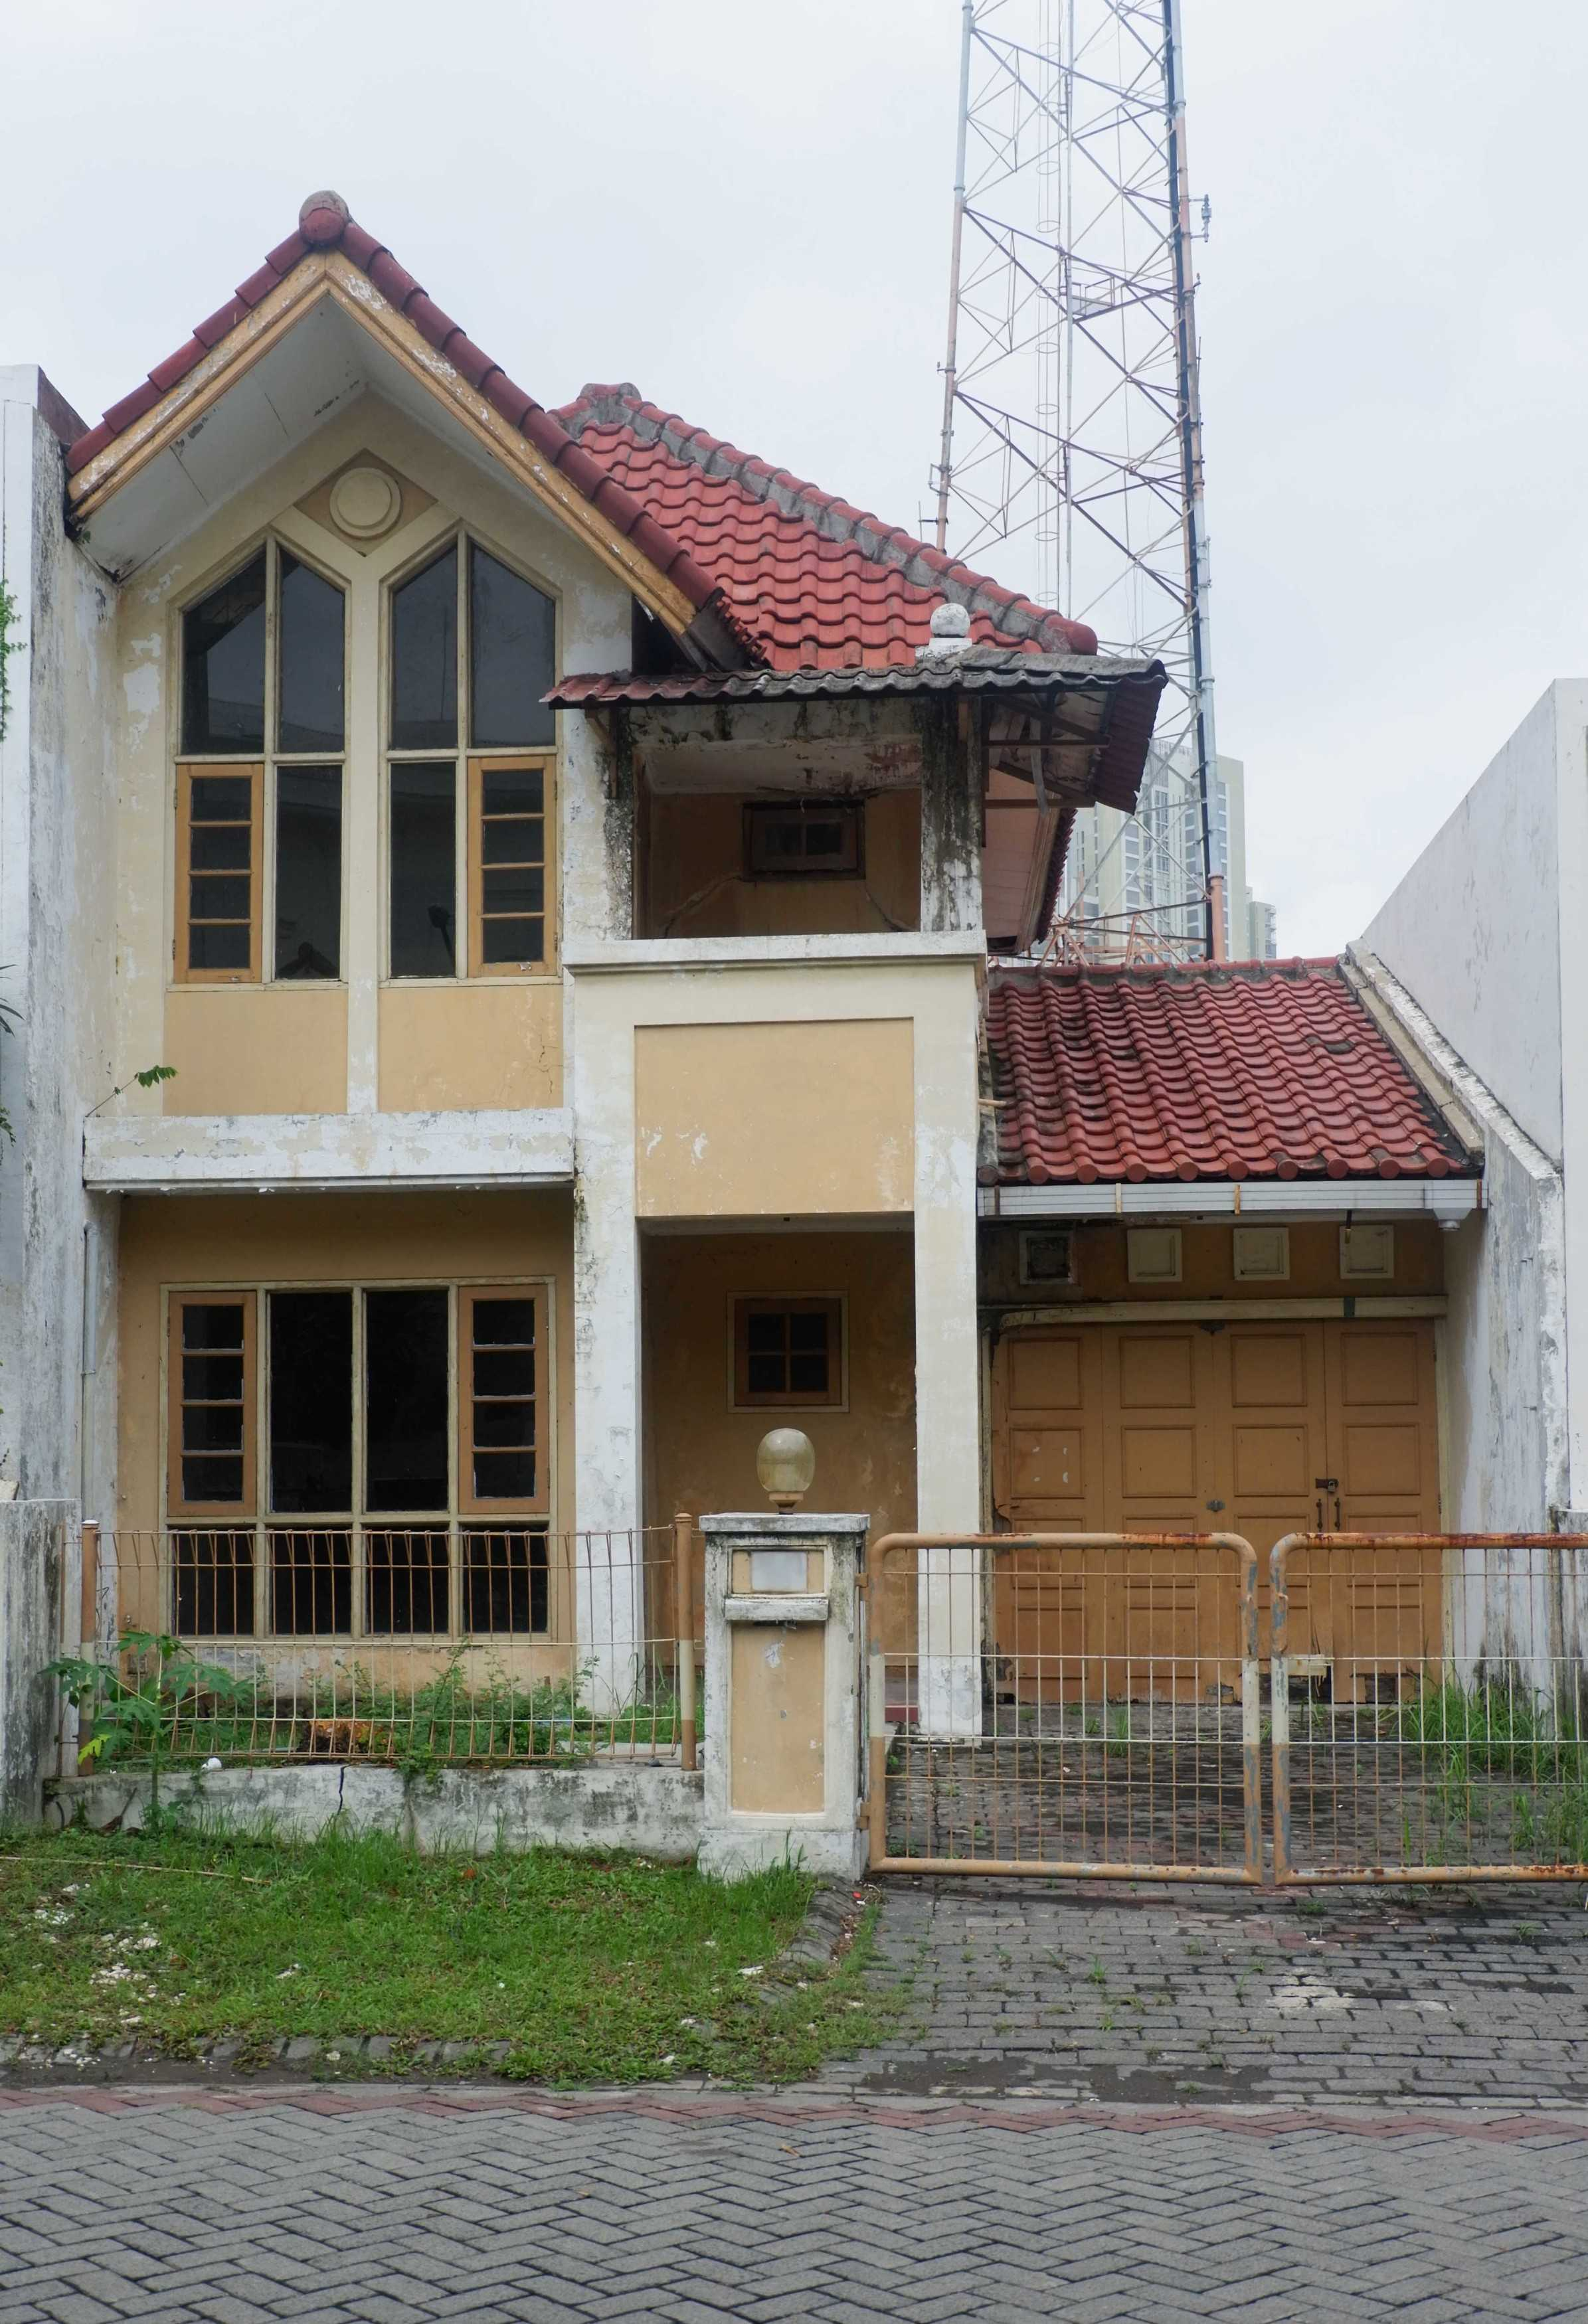 Fanny Felina Architecture & Interior Design Vv X House Surabaya, Surabaya City, East Java, Indonesia Surabaya, Surabaya City, East Java, Indonesia Fanny-Felina-Architecture-Interior-Design-Vv-X-House   50078